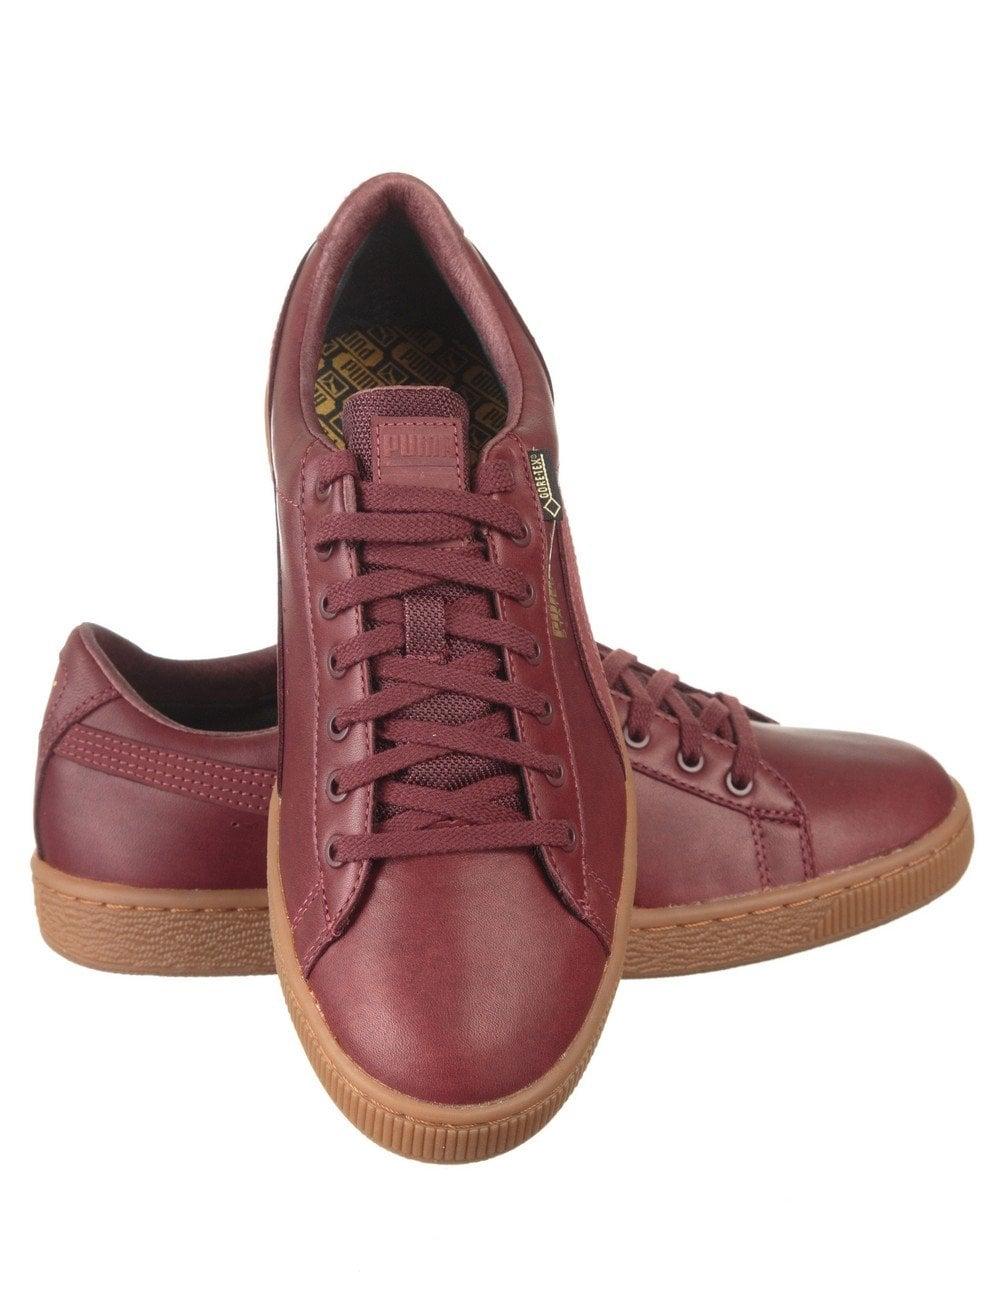 énorme réduction a790f d7ebd States GTX Shoes - Italian Plum